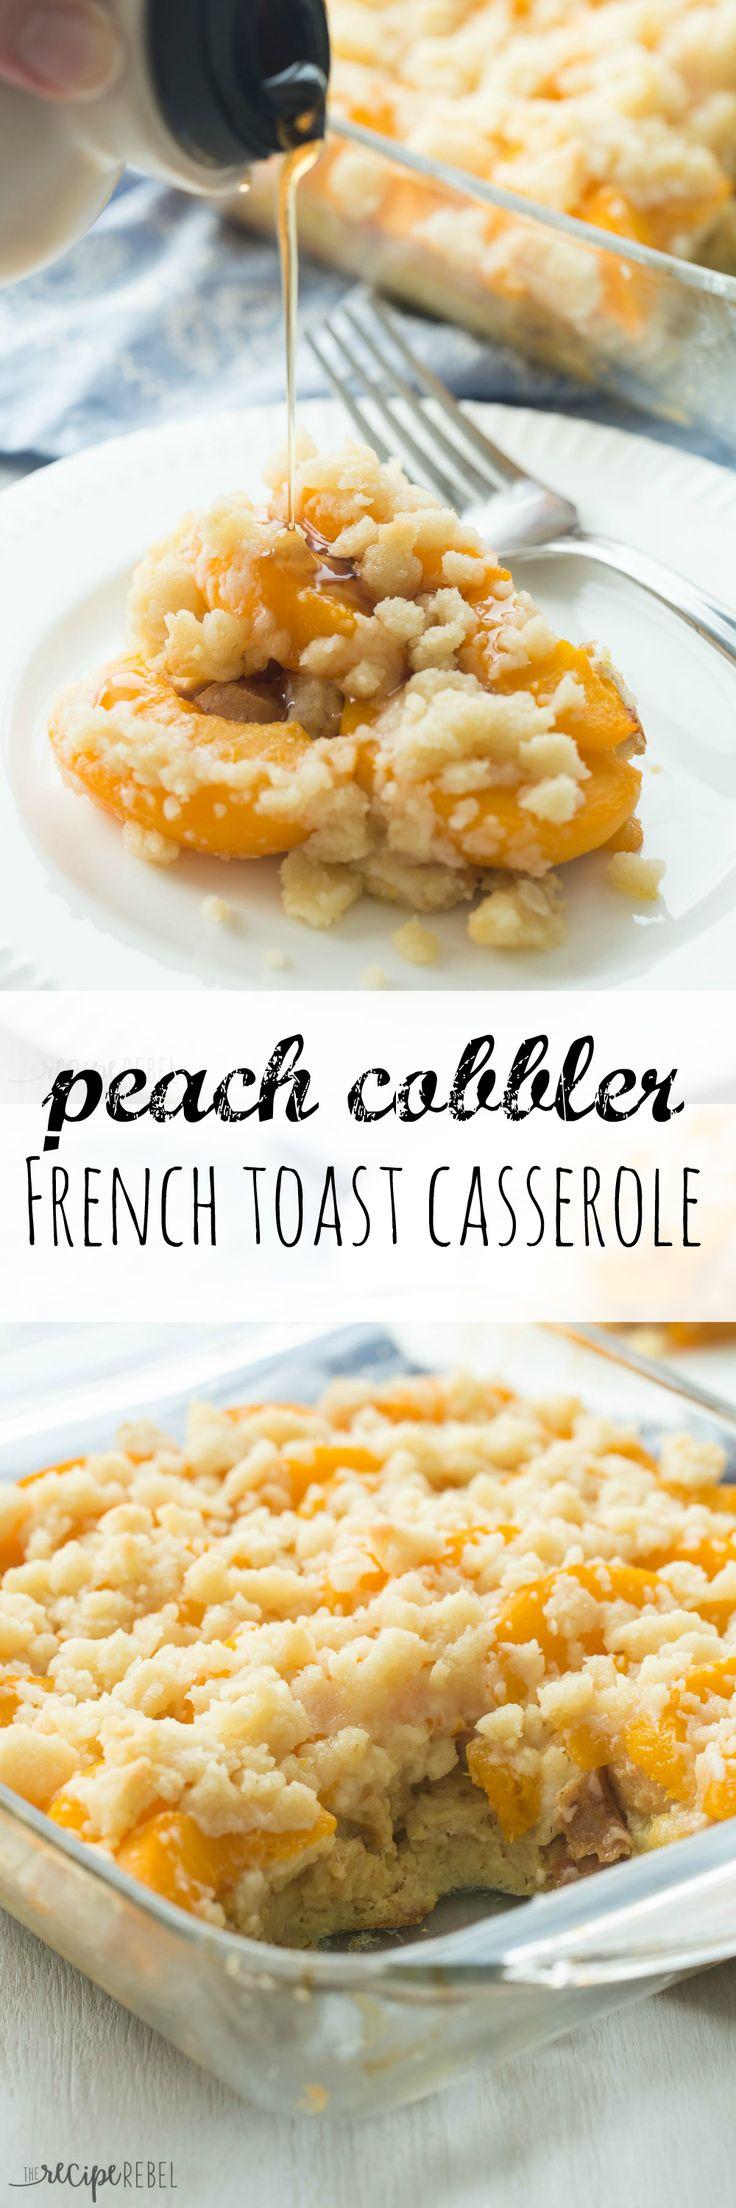 best Breakfast images on Pinterest  Breakfast Cooker recipes